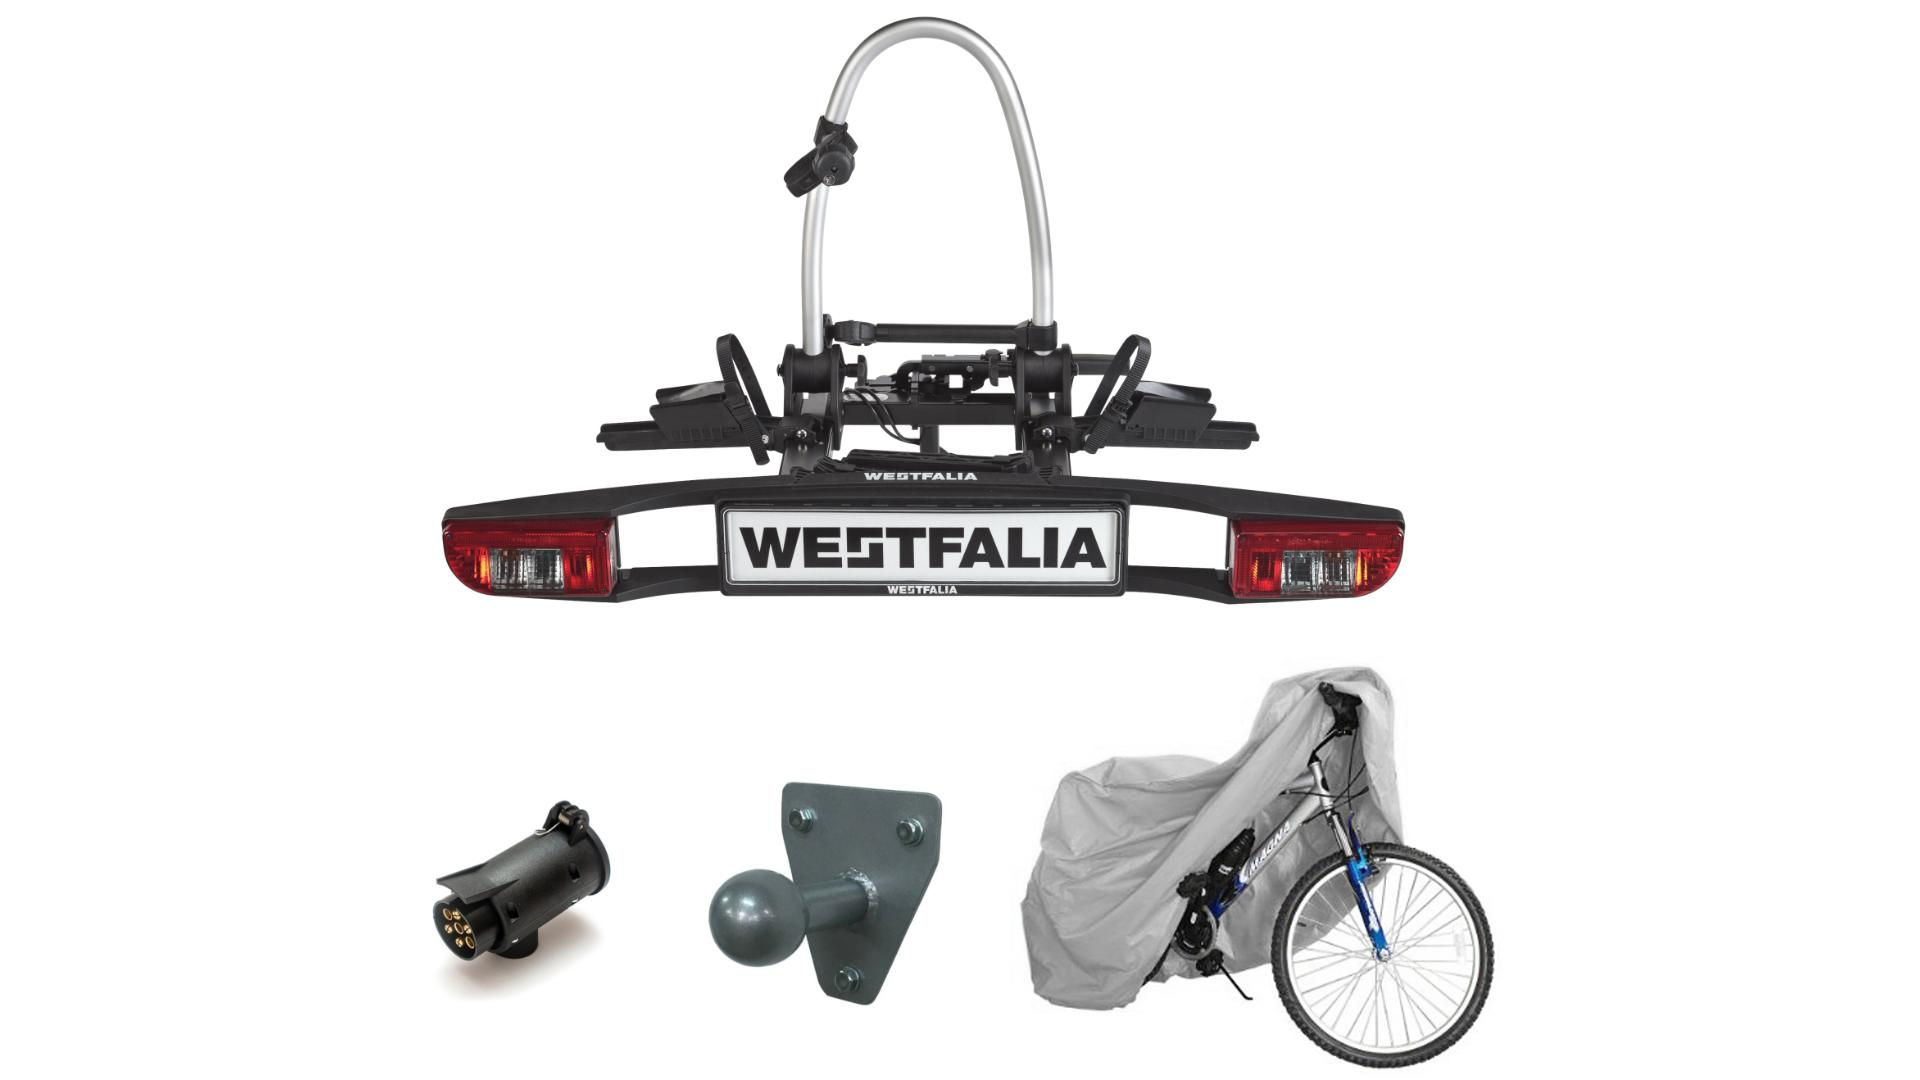 Westfalia BC 60 - nosič bicyklov na ťažné zariadenie (2 bicykle)